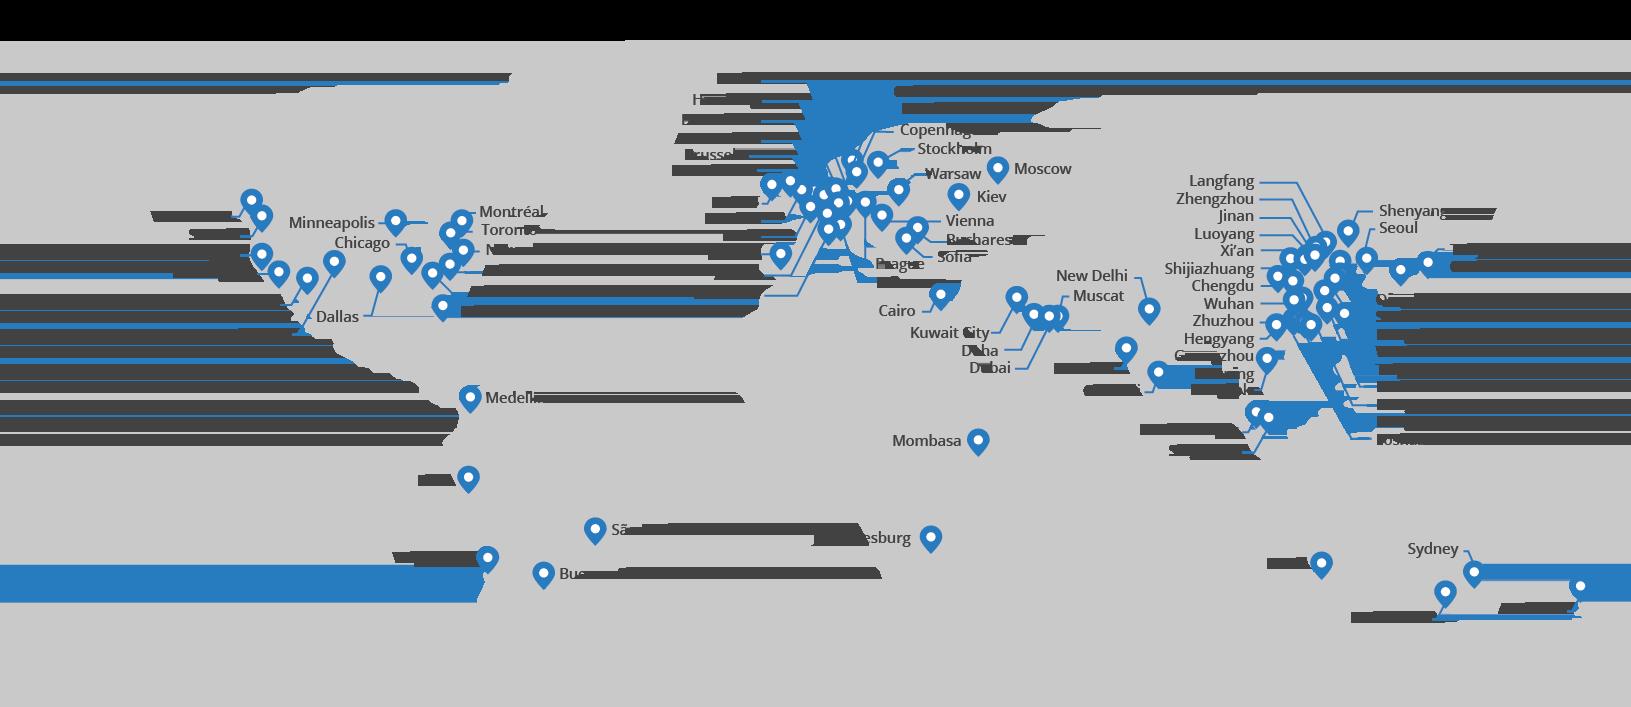 e-Sathi.com is using local data center (Kathmandu, New Delhi) on chennai world map, colombo world map, karachi world map, calcutta world map, kabul world map, madinah world map, hyderabad world map, taipei world map, thimphu world map, pyongyang world map, dhaka world map, pune world map, mumbai world map, new delhi world map, phoenix world map, islamabad world map, rangoon world map, fujairah world map, male world map, lumbini world map,